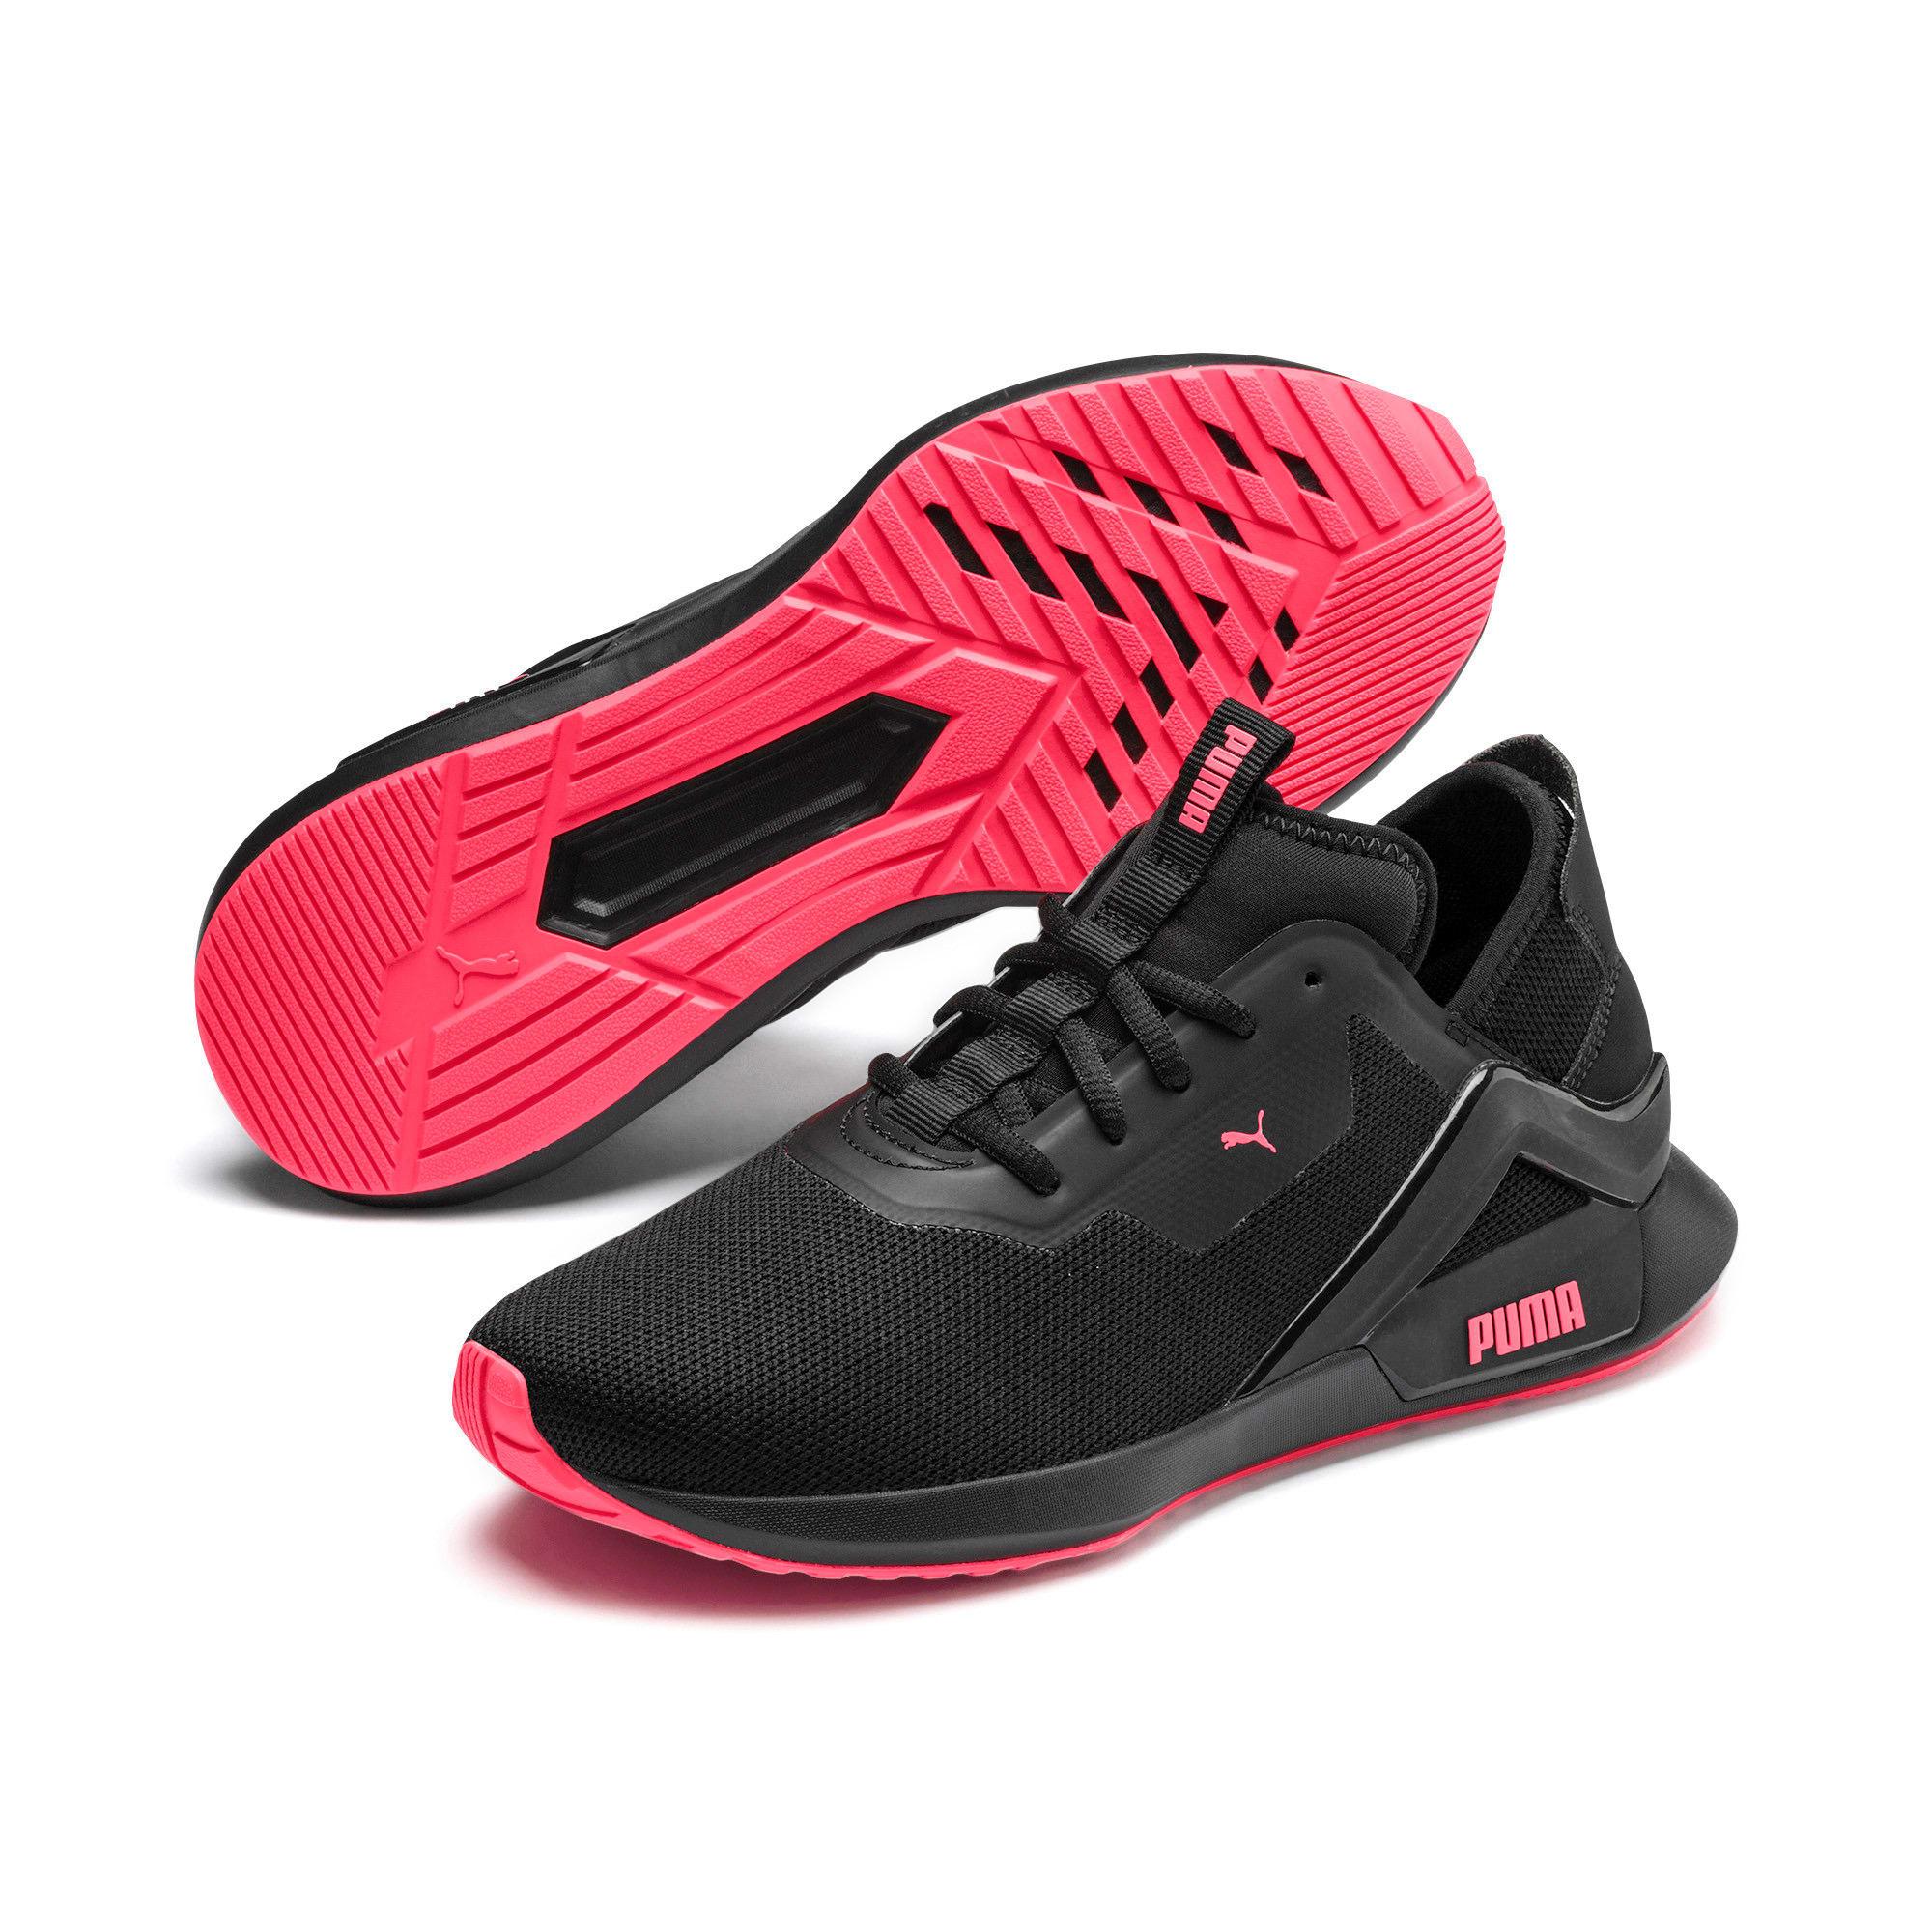 Thumbnail 4 of Rogue X Knit Women's Running Shoes, Puma Black-Pink Alert, medium-IND